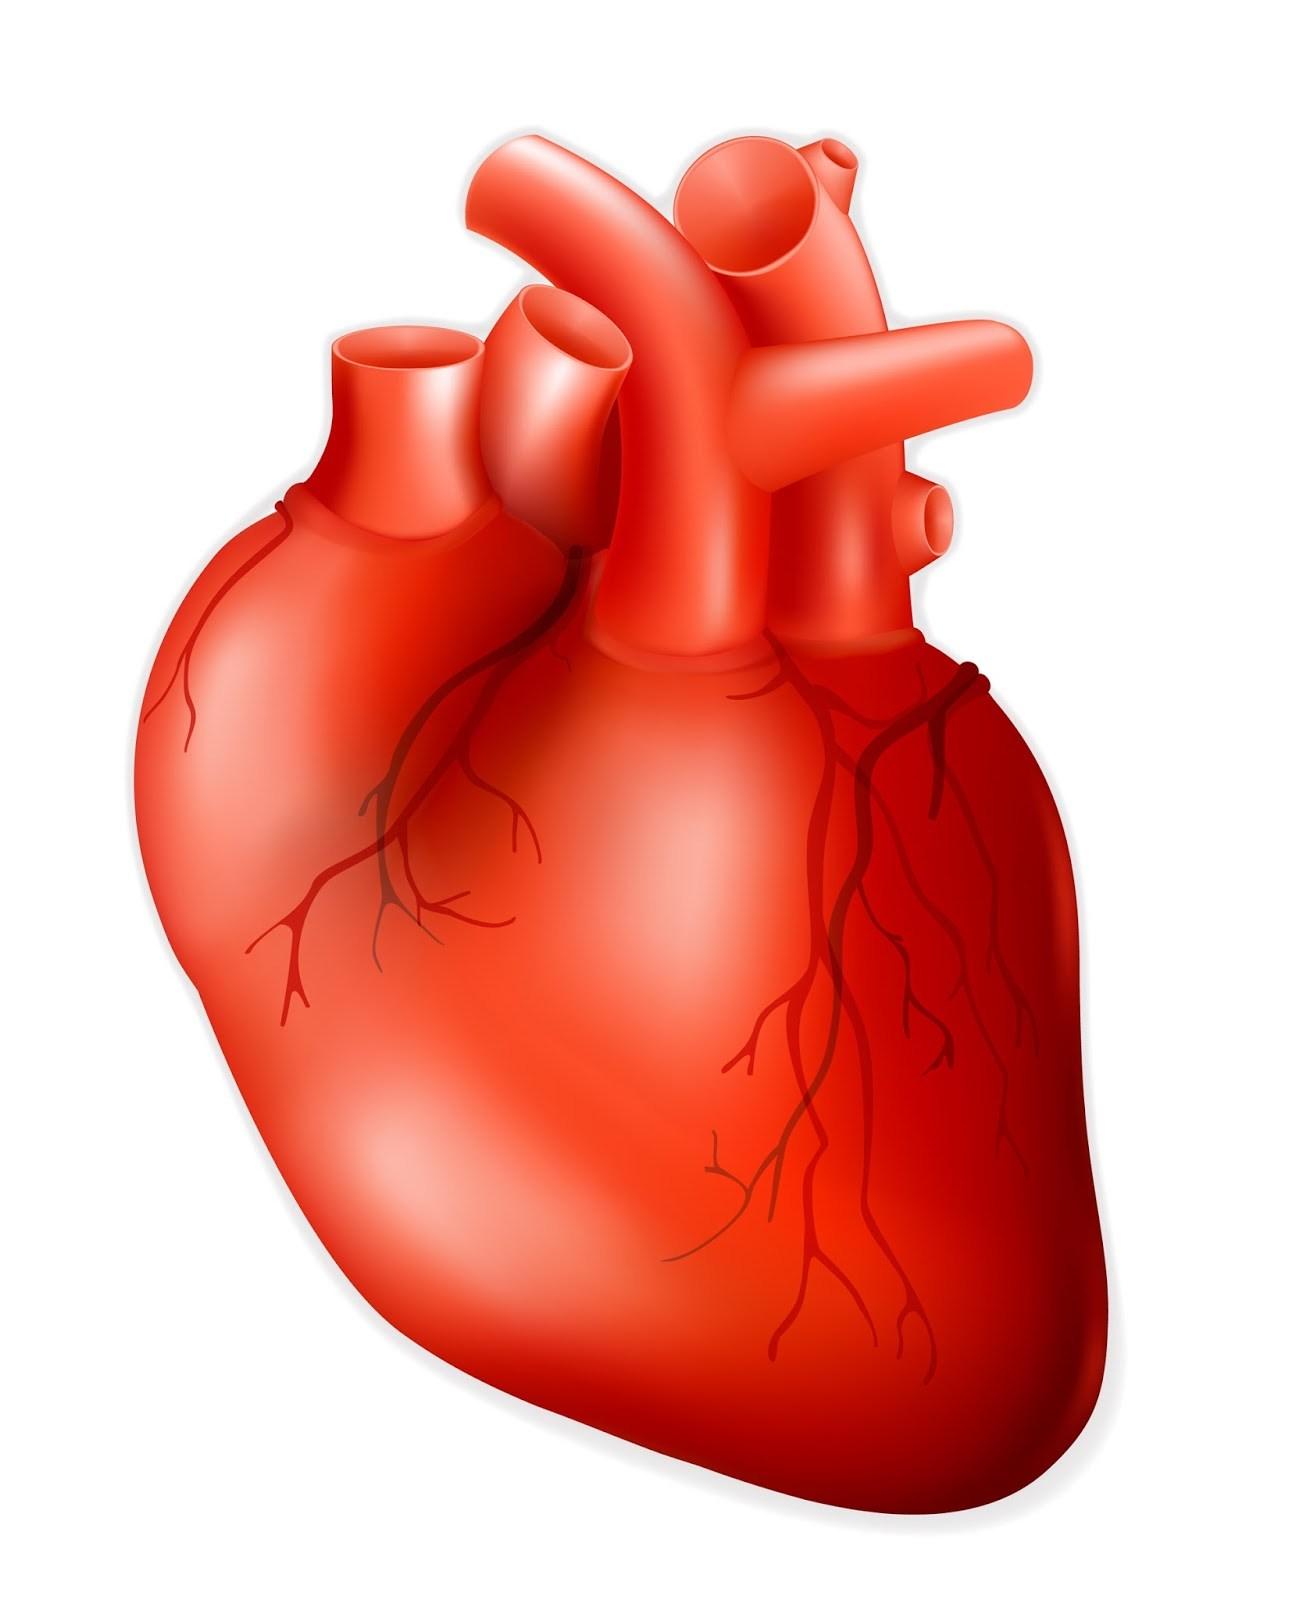 Human Heart Clipart at GetDrawings.com.